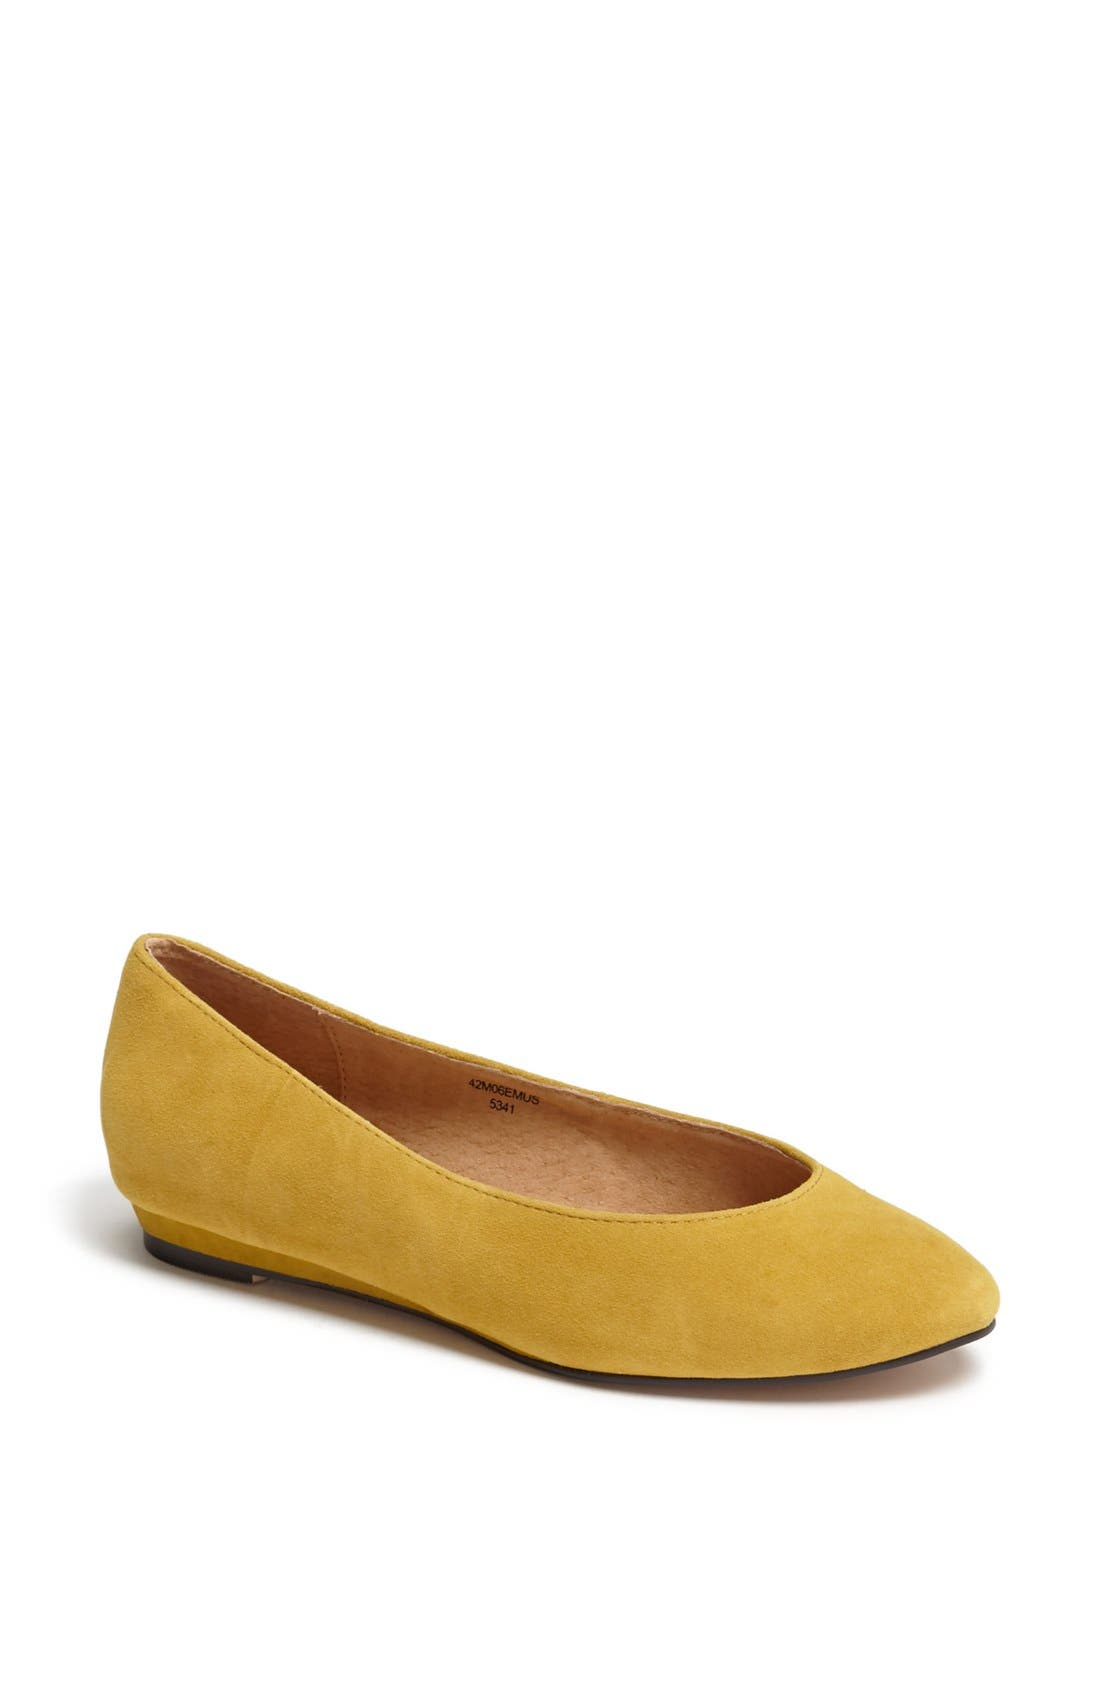 'Mello Mini Wedge' Court Shoe,                         Main,                         color, Mustard